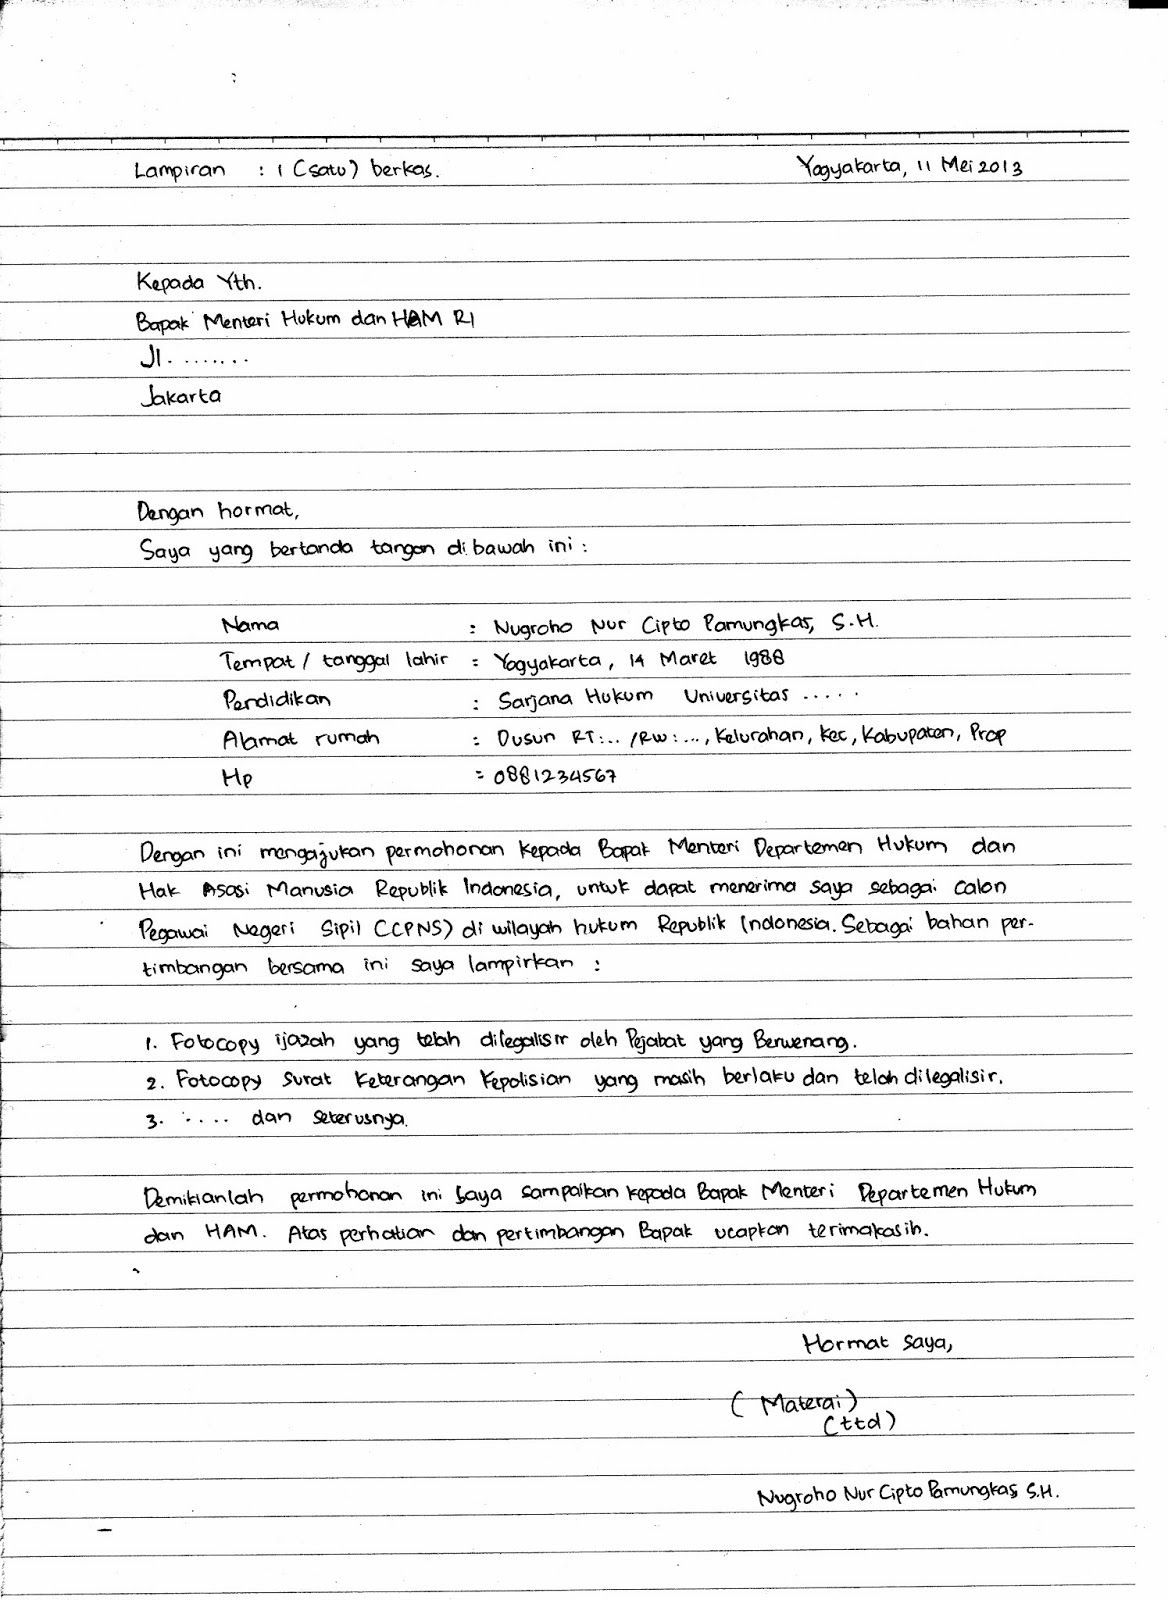 Surat Lamaran Kerja Harus Tulis Tangan Tulisan